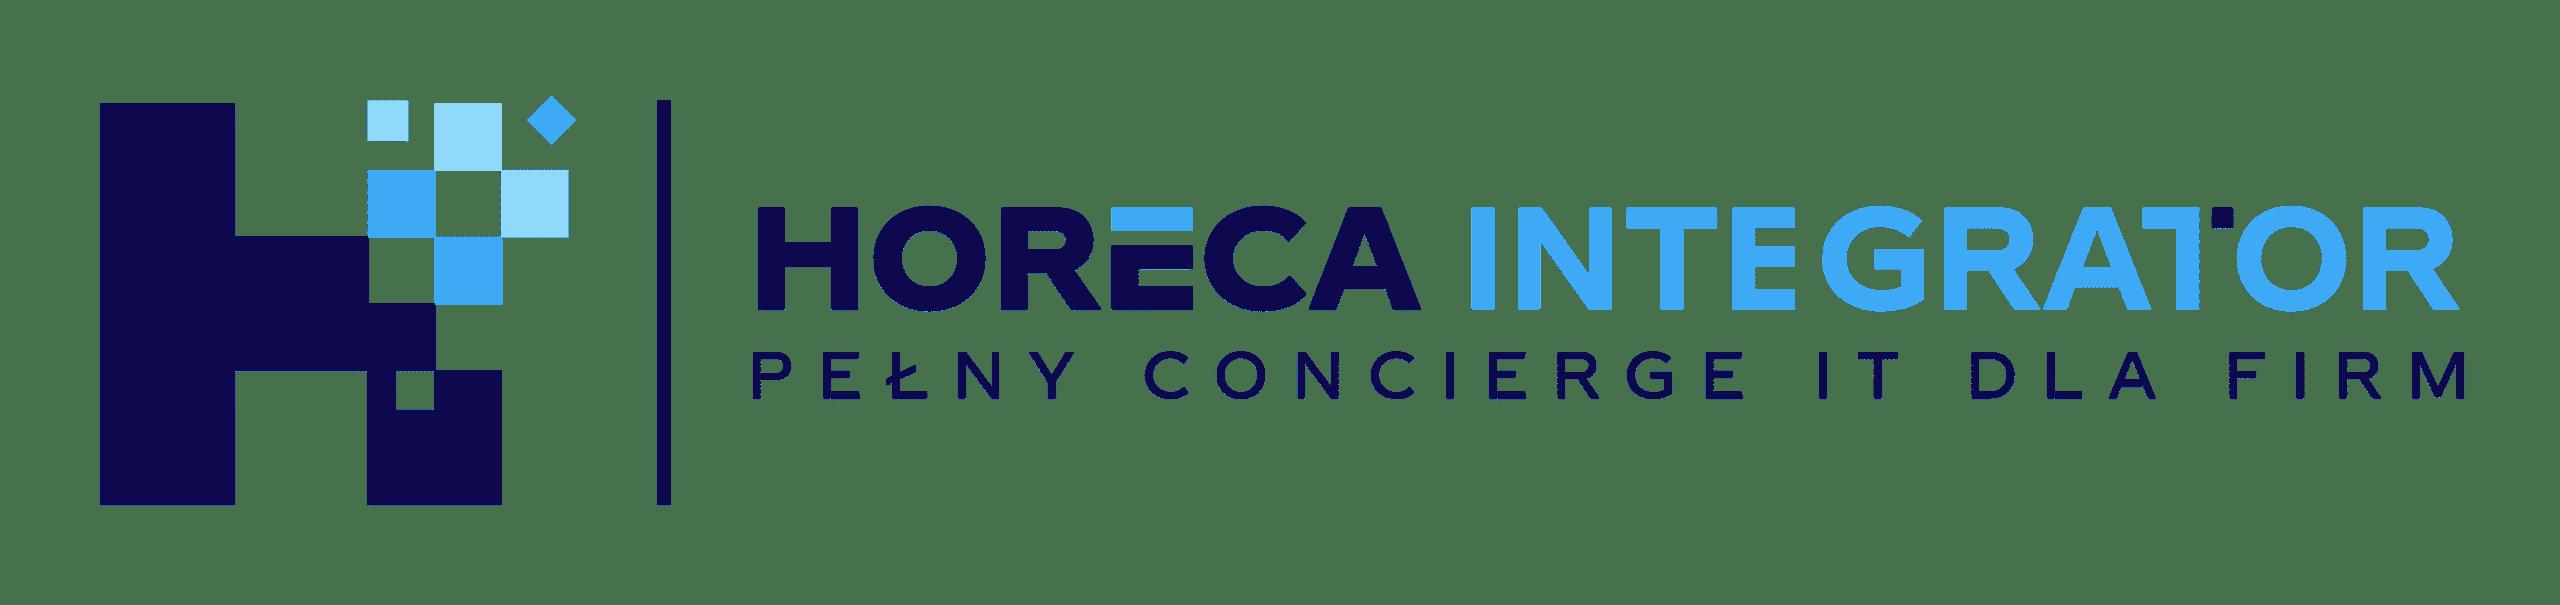 Horeca Integrator